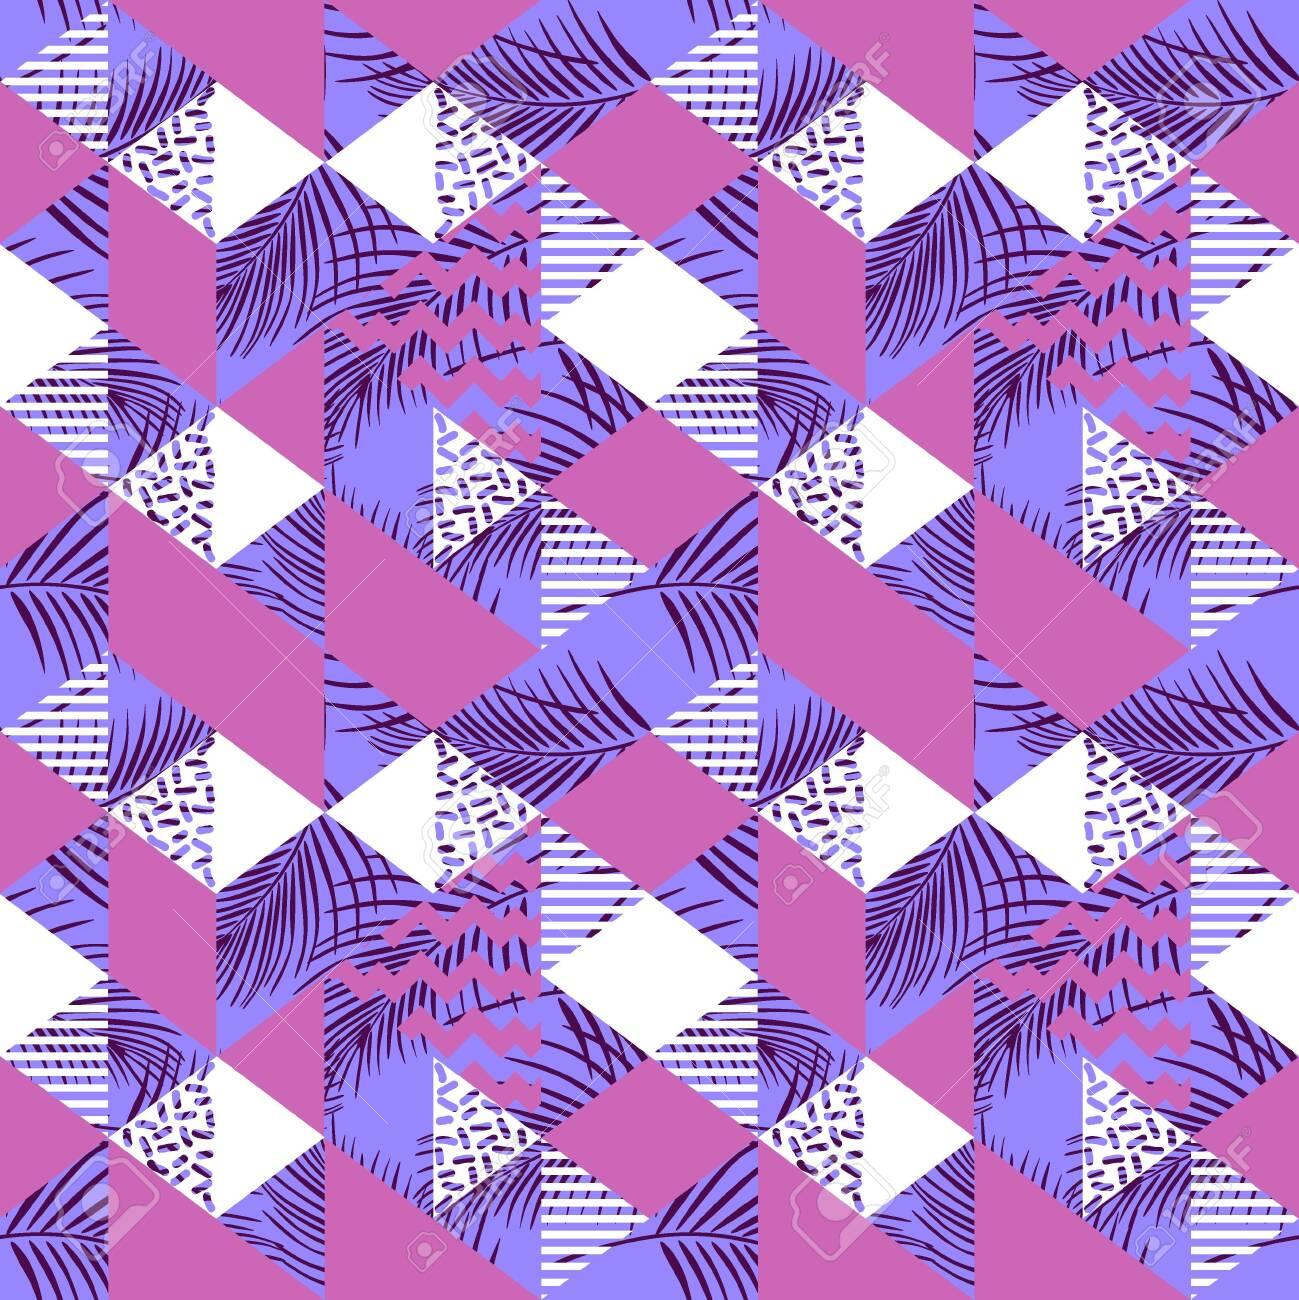 Feminine geometric triangle abstract seamless pattern - 129460211